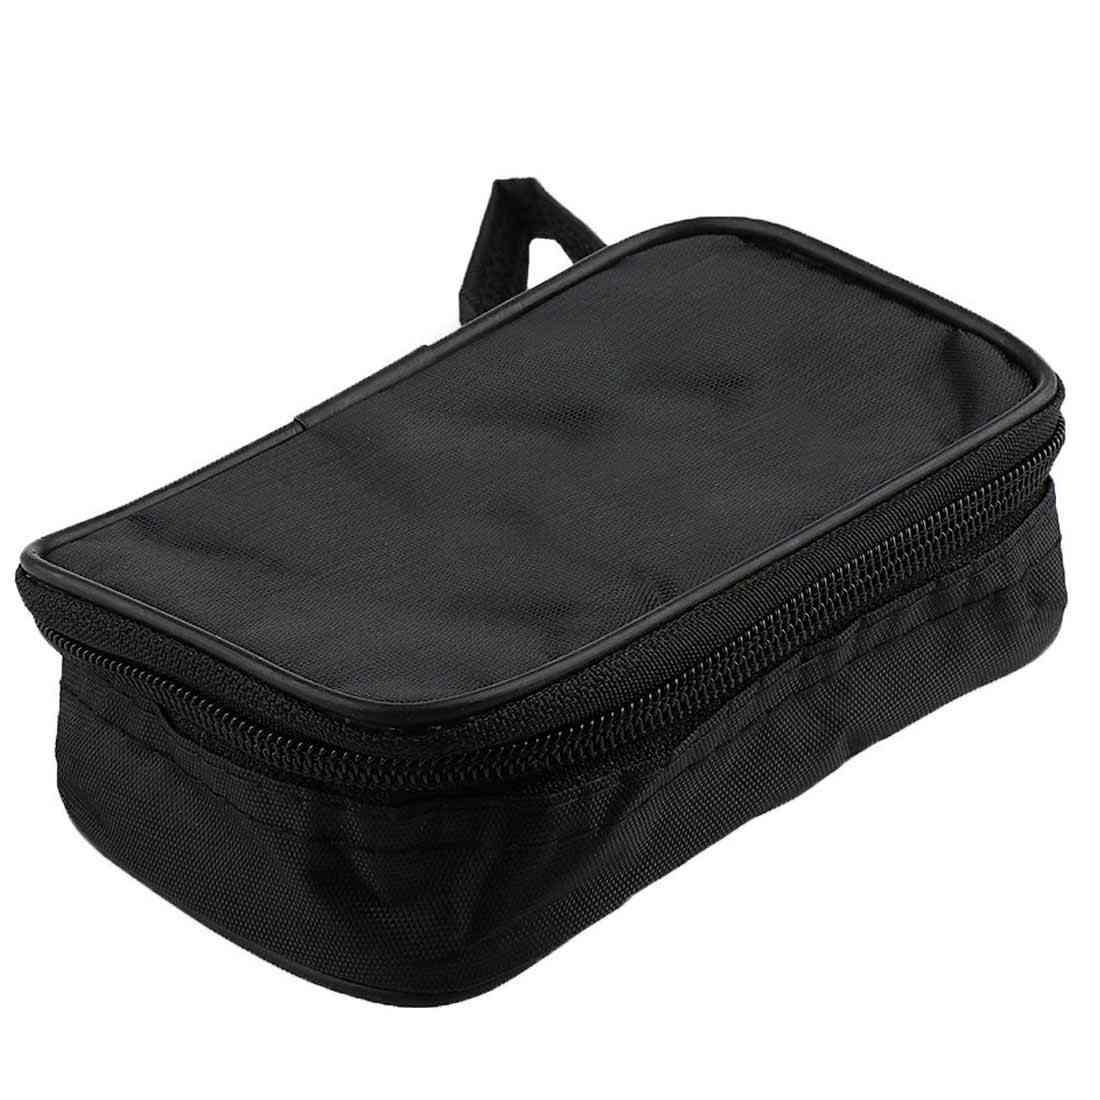 Canvas Soft Case Waterproof Shockproof Multimeter Black Bag